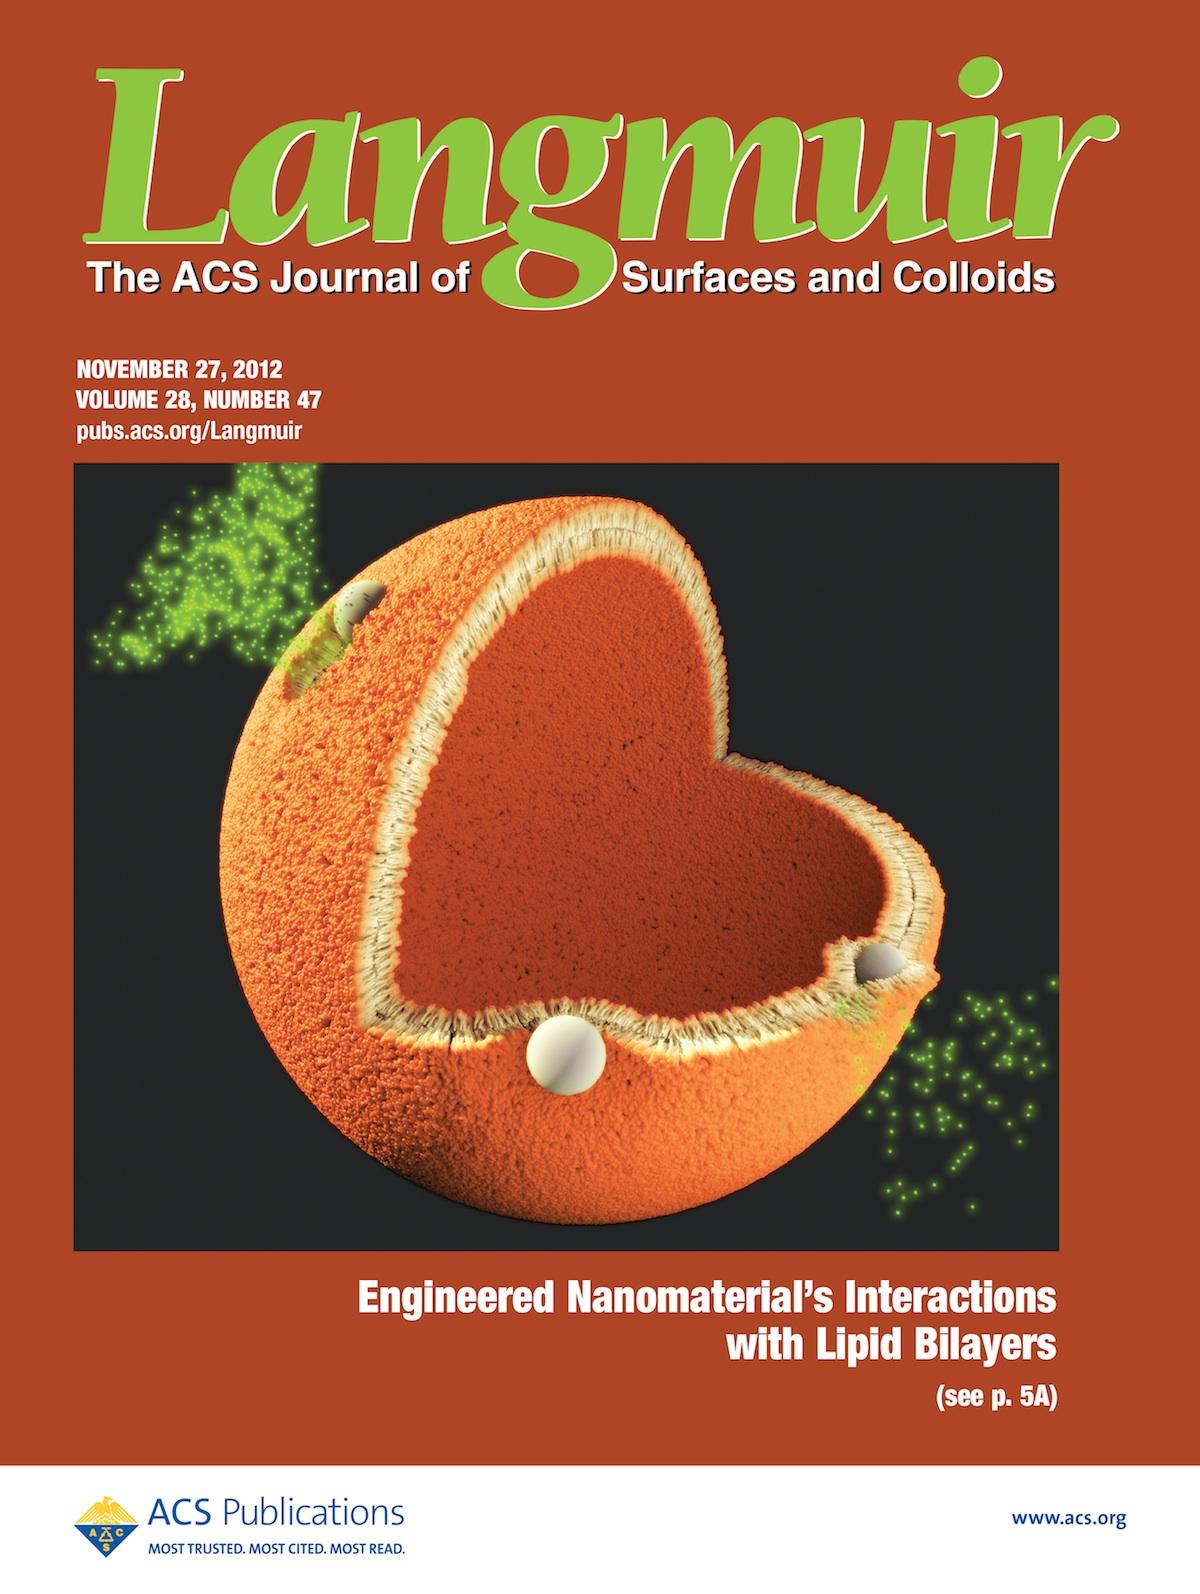 Nov 2012 Cover of Langmuir